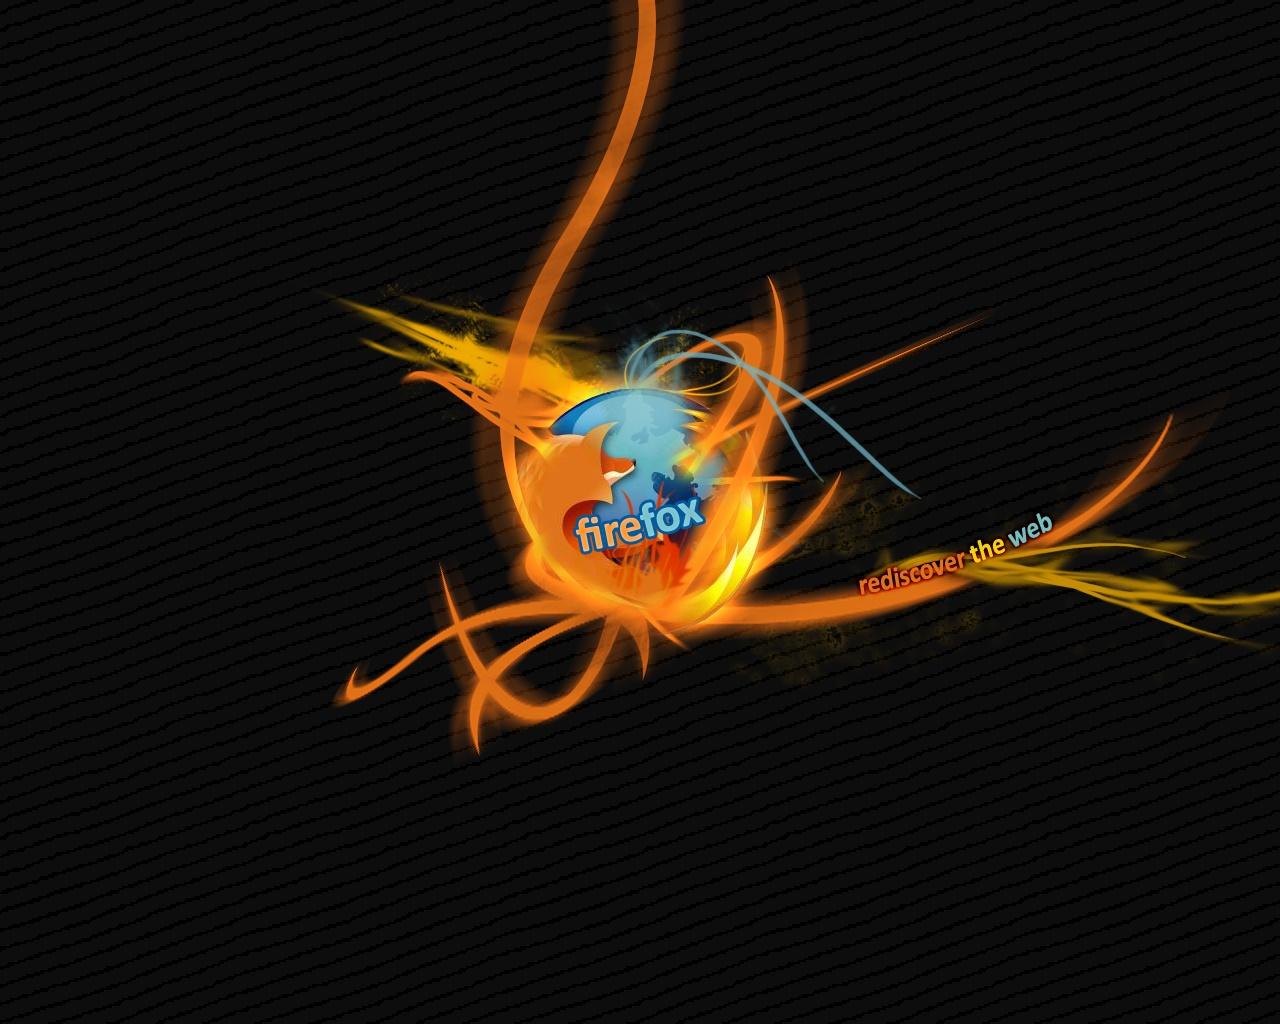 http://3.bp.blogspot.com/-27yzmEUBfcw/UPC8XGxFBMI/AAAAAAAAHfA/fVER31k-G0o/s1600/Burning+Firefox.jpg